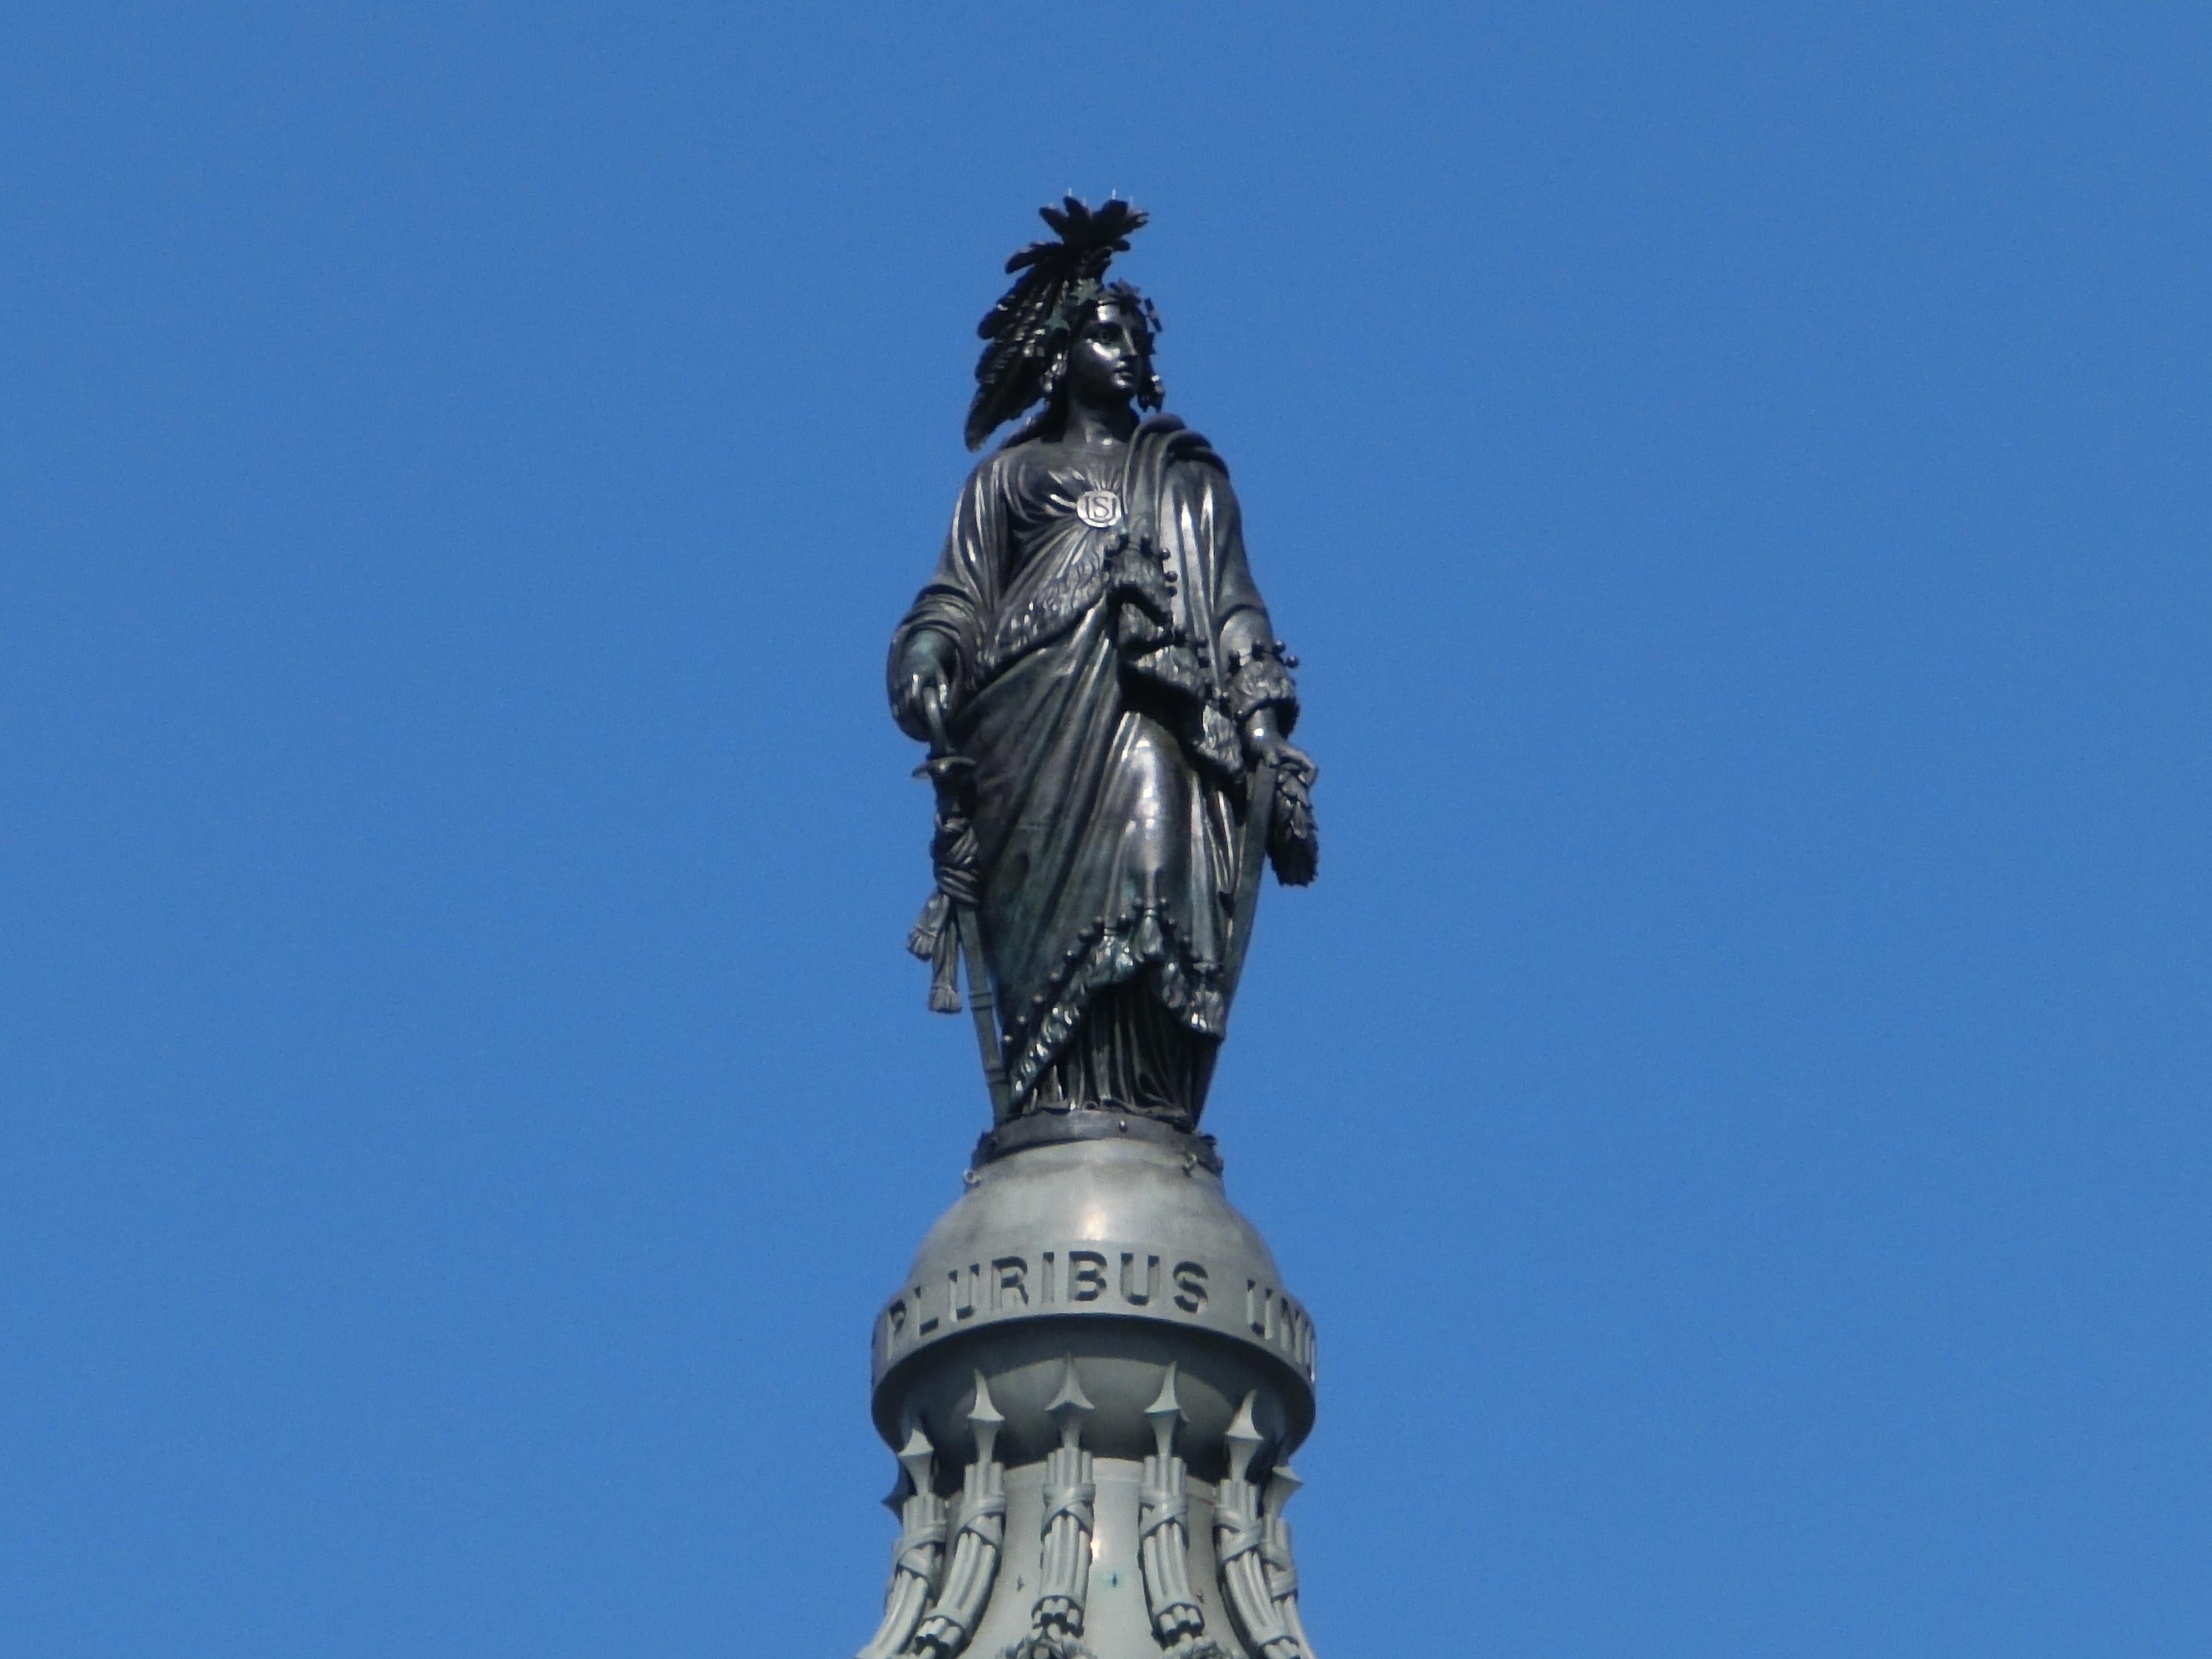 Fotos gratis : Monumento, estatua, Estados Unidos, America, punto de ...